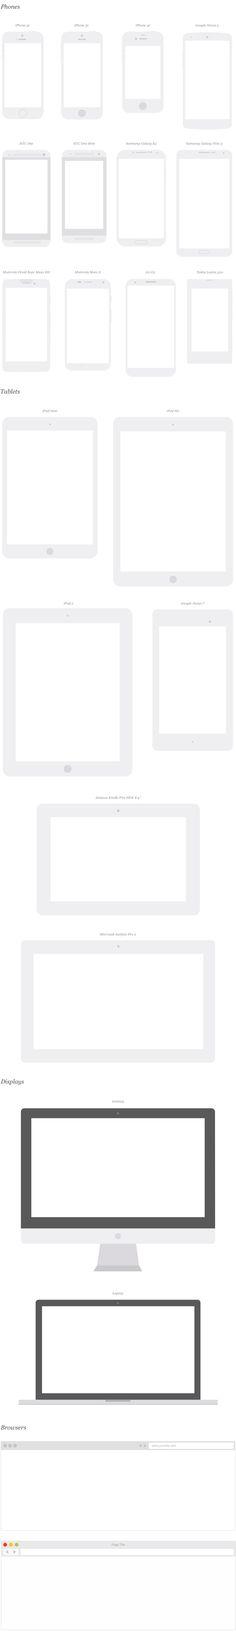 Free Mobile Device Mockups OmniGraffle Stencil and Illustrator Template – UX Kits